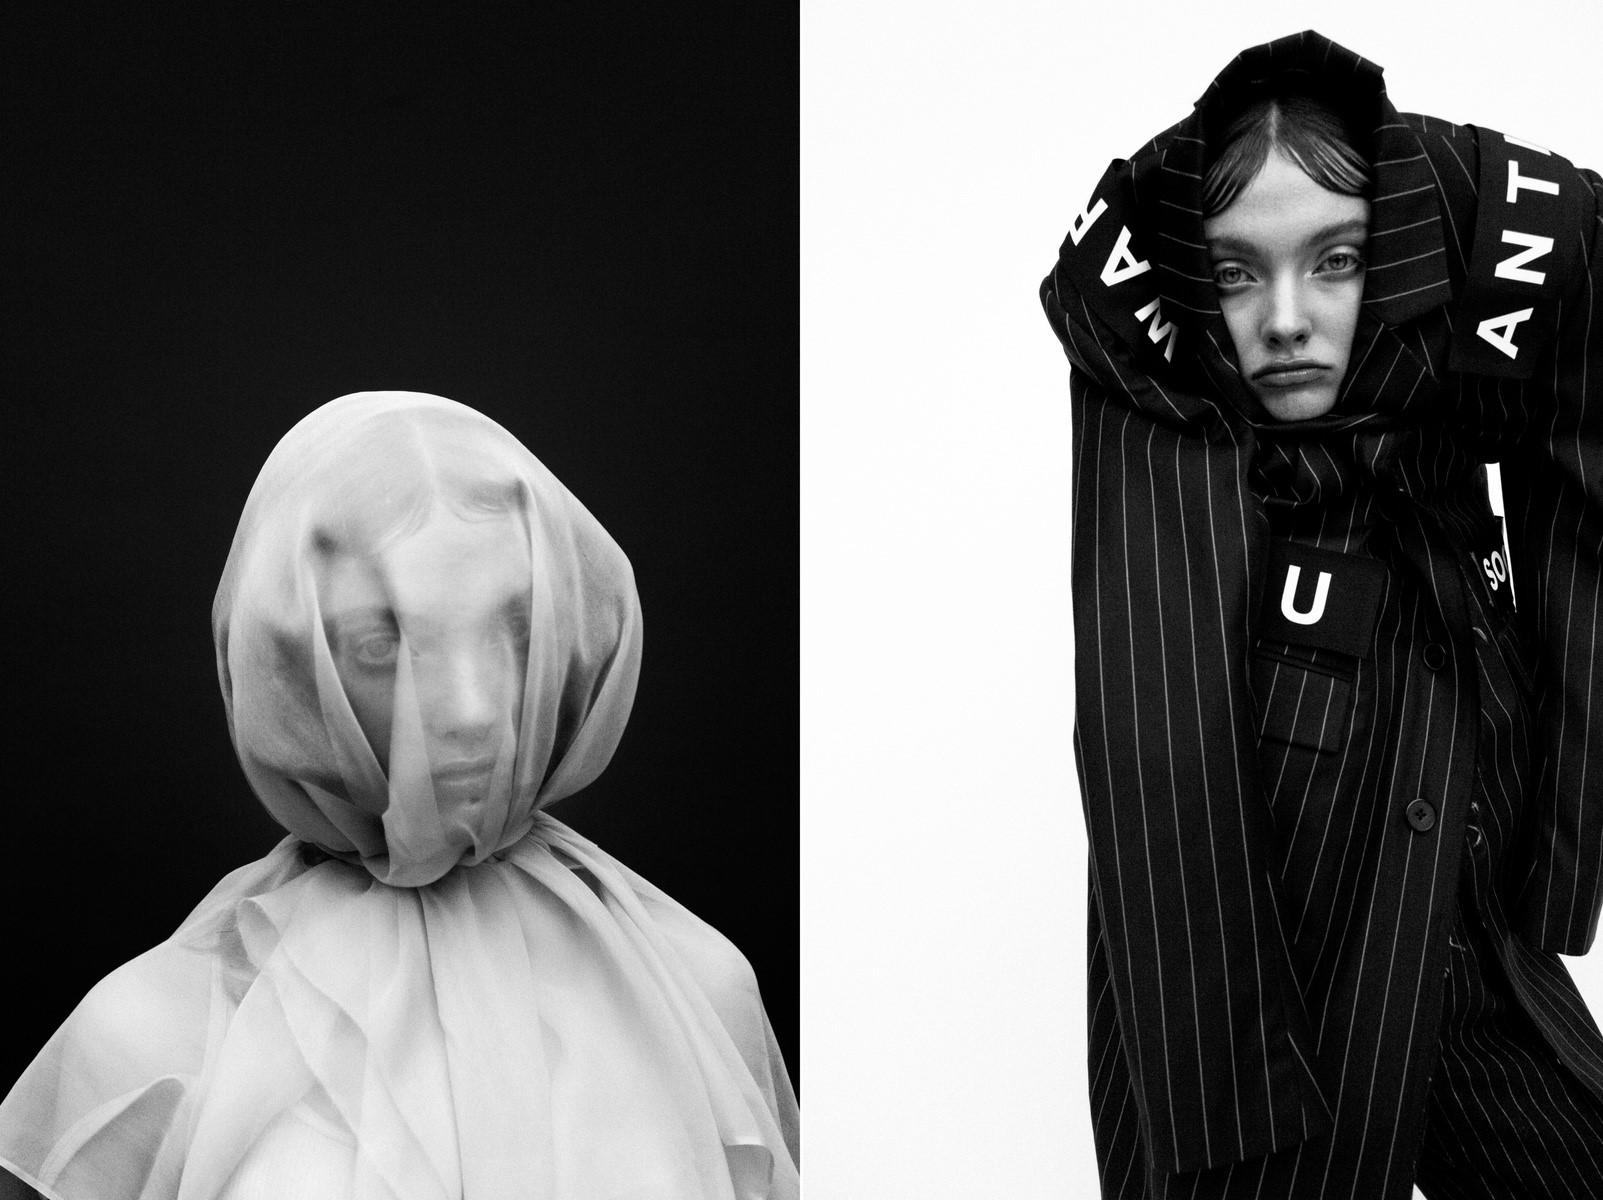 Photography by Evgenii Shishkin